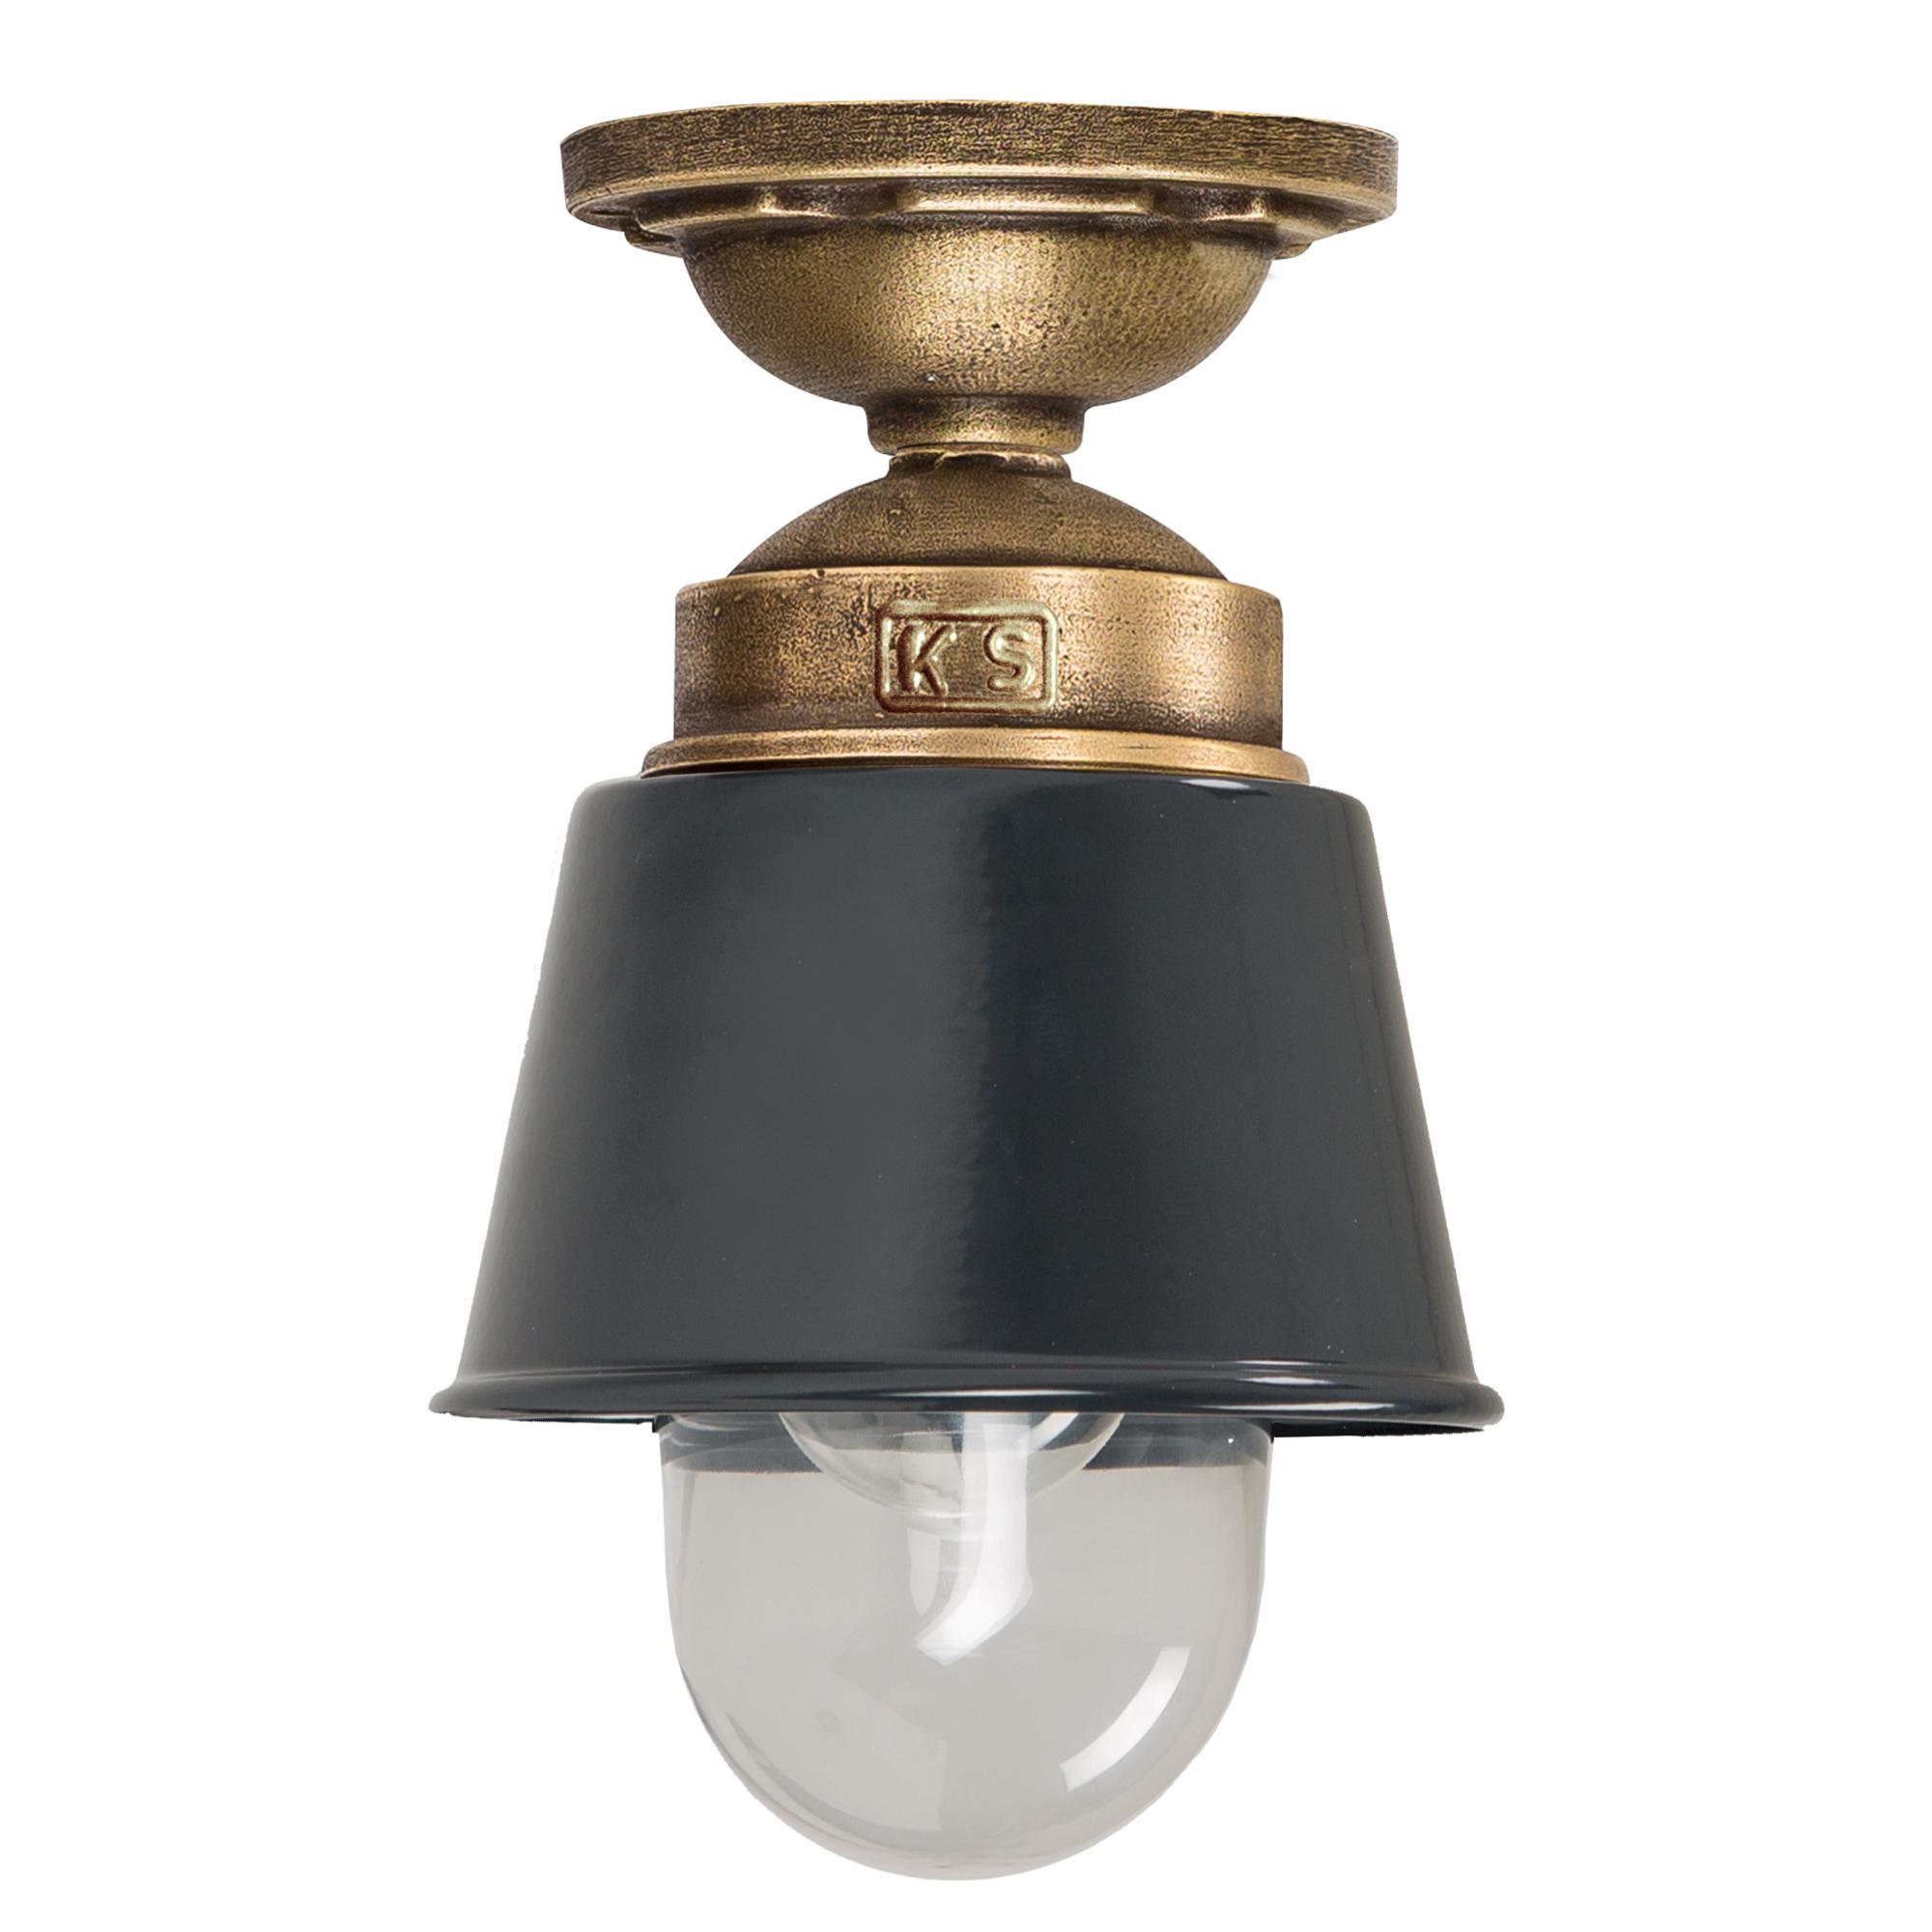 Kostas Brass Plafondlamp Antraciet